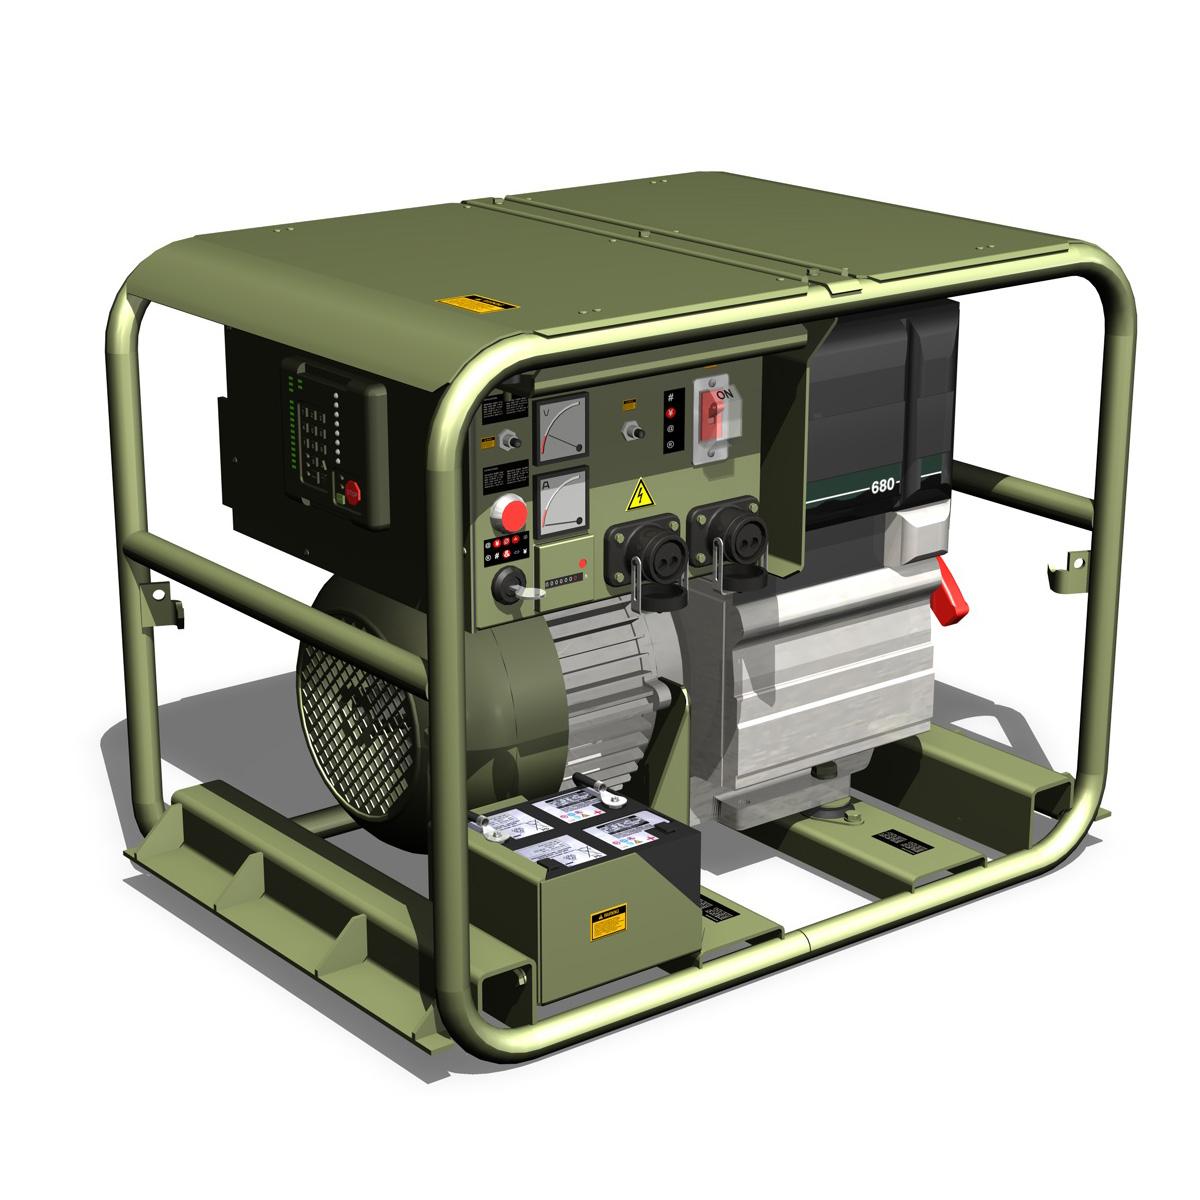 military diesel generator 3d model 3ds fbx c4d lwo obj 188556